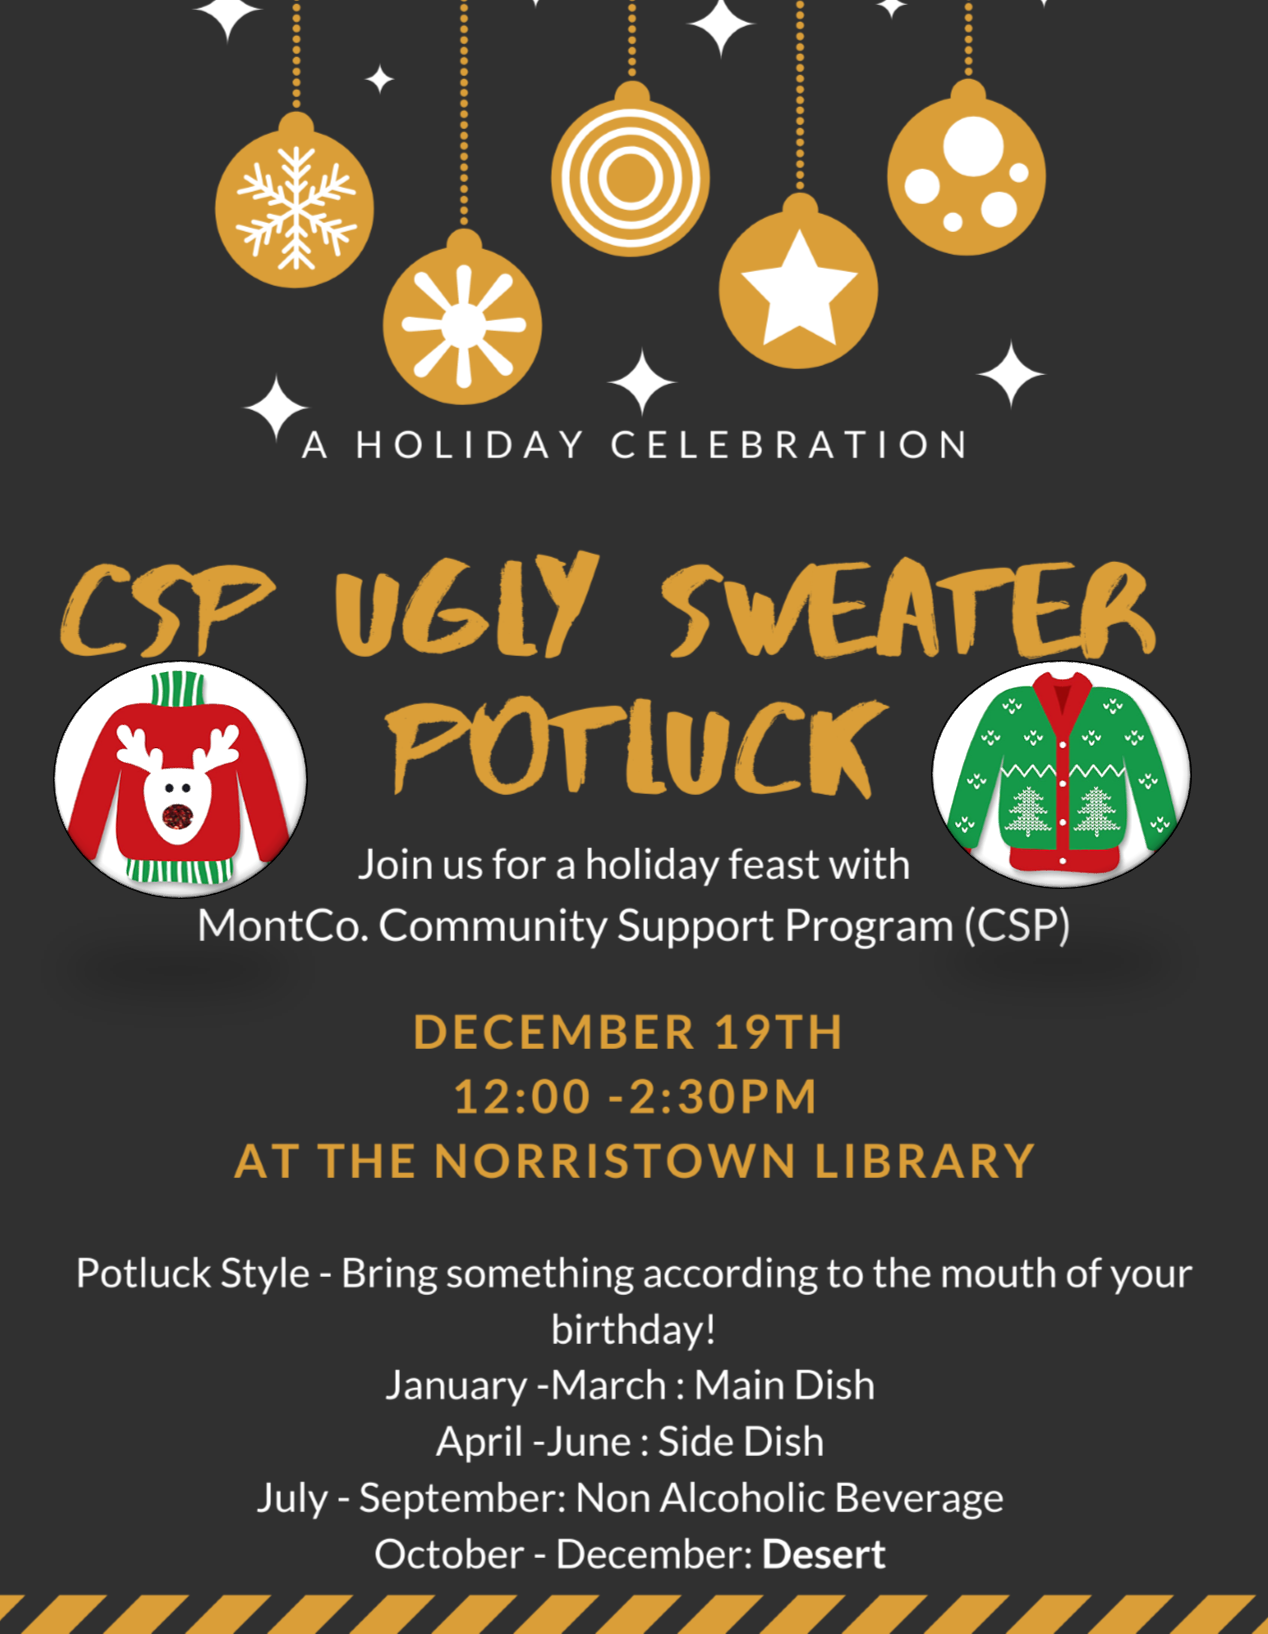 Ugly Sweater Potluck at CSP